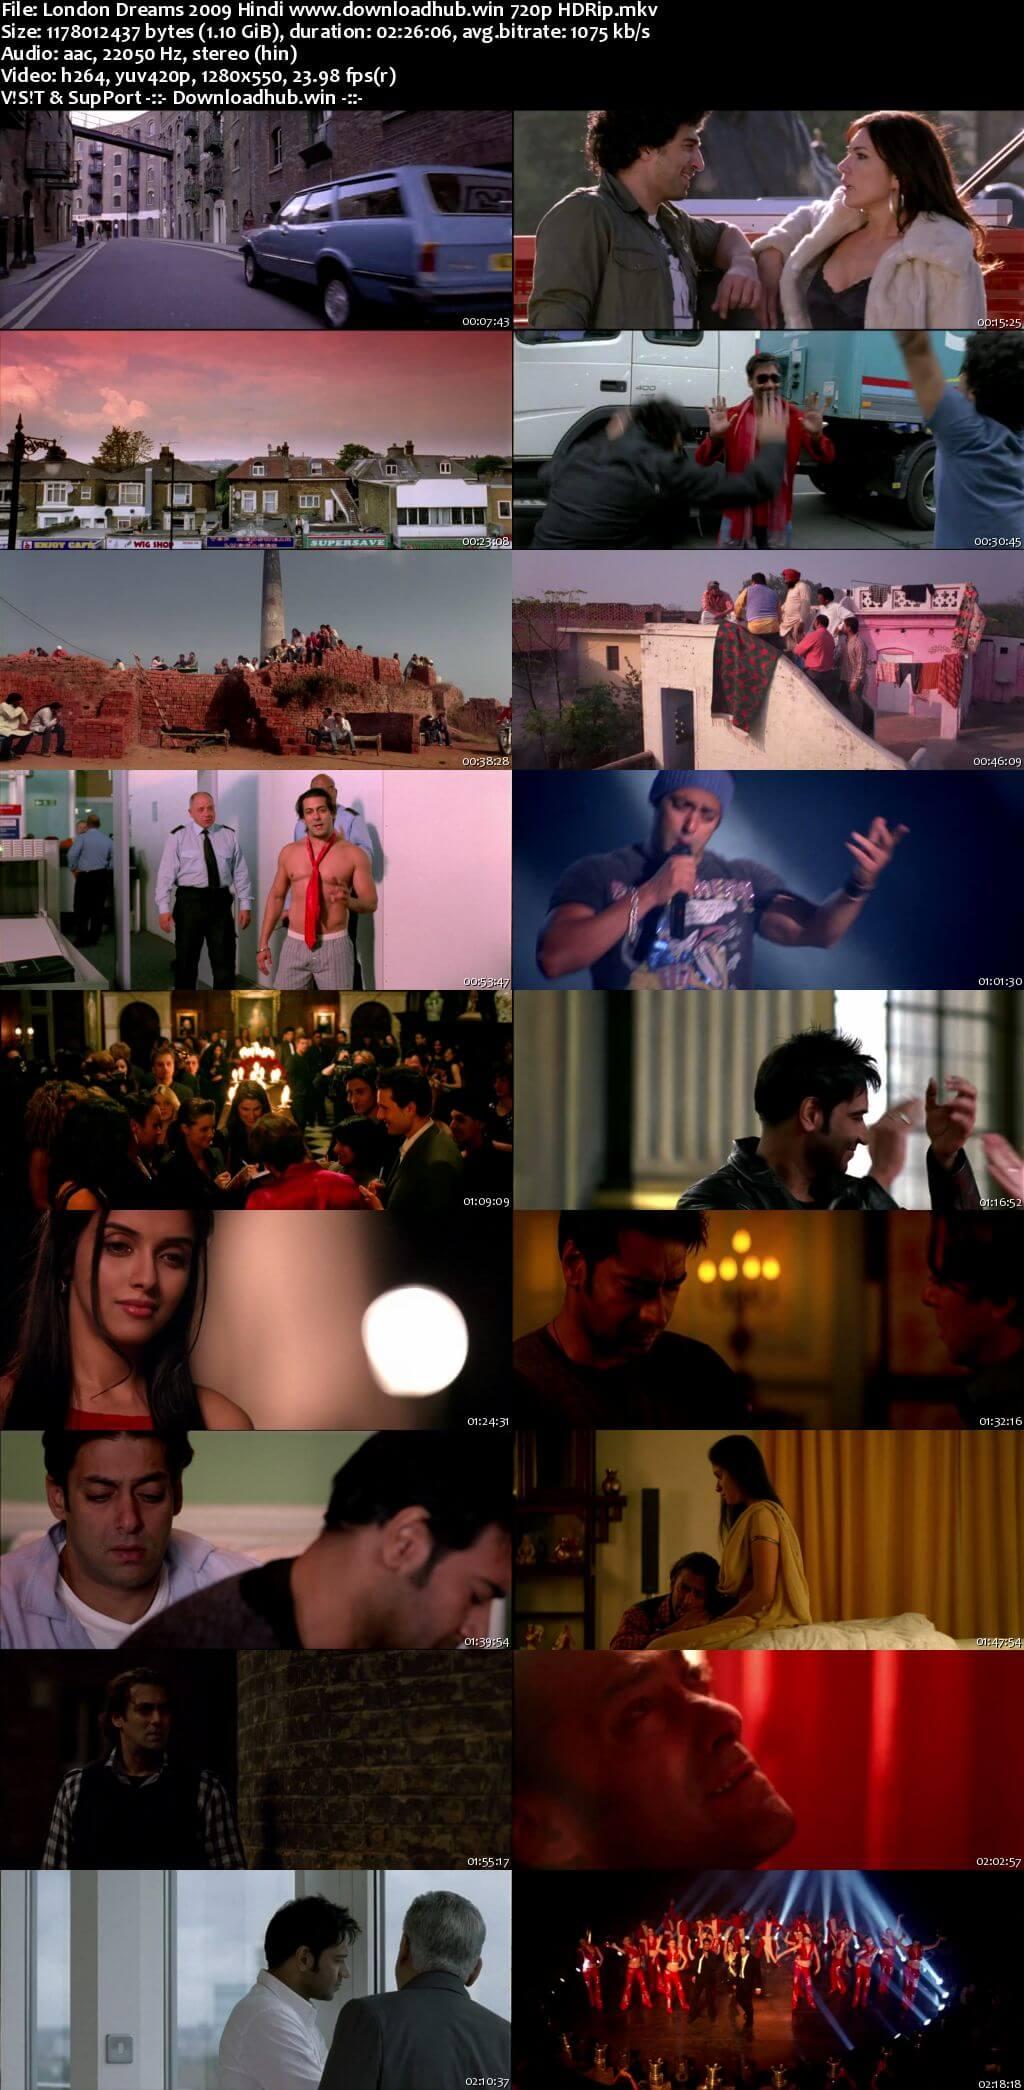 London Dreams 2009 Hindi 720p HDRip x264